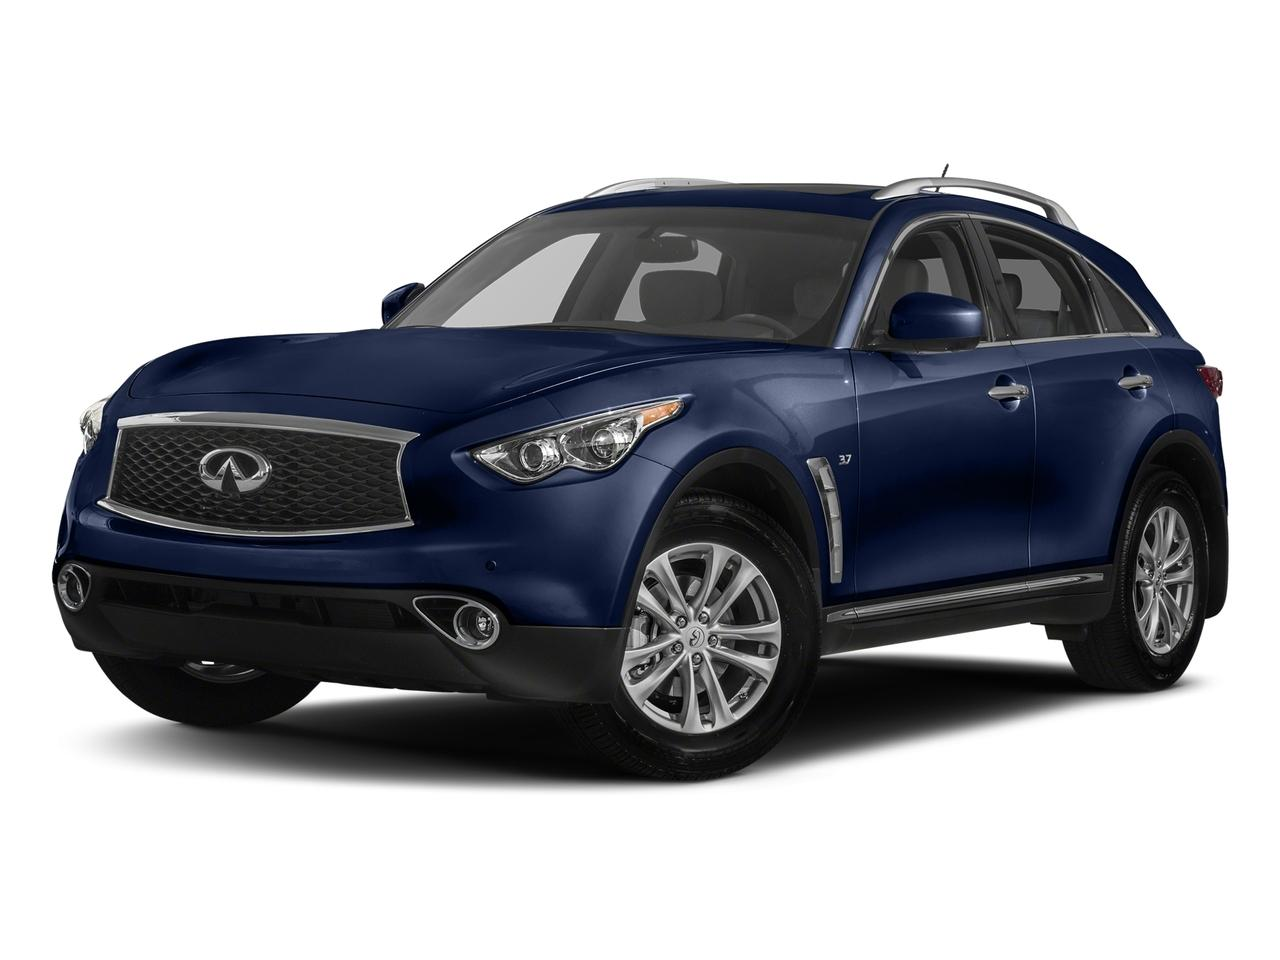 2017 INFINITI QX70 Vehicle Photo in San Antonio, TX 78230